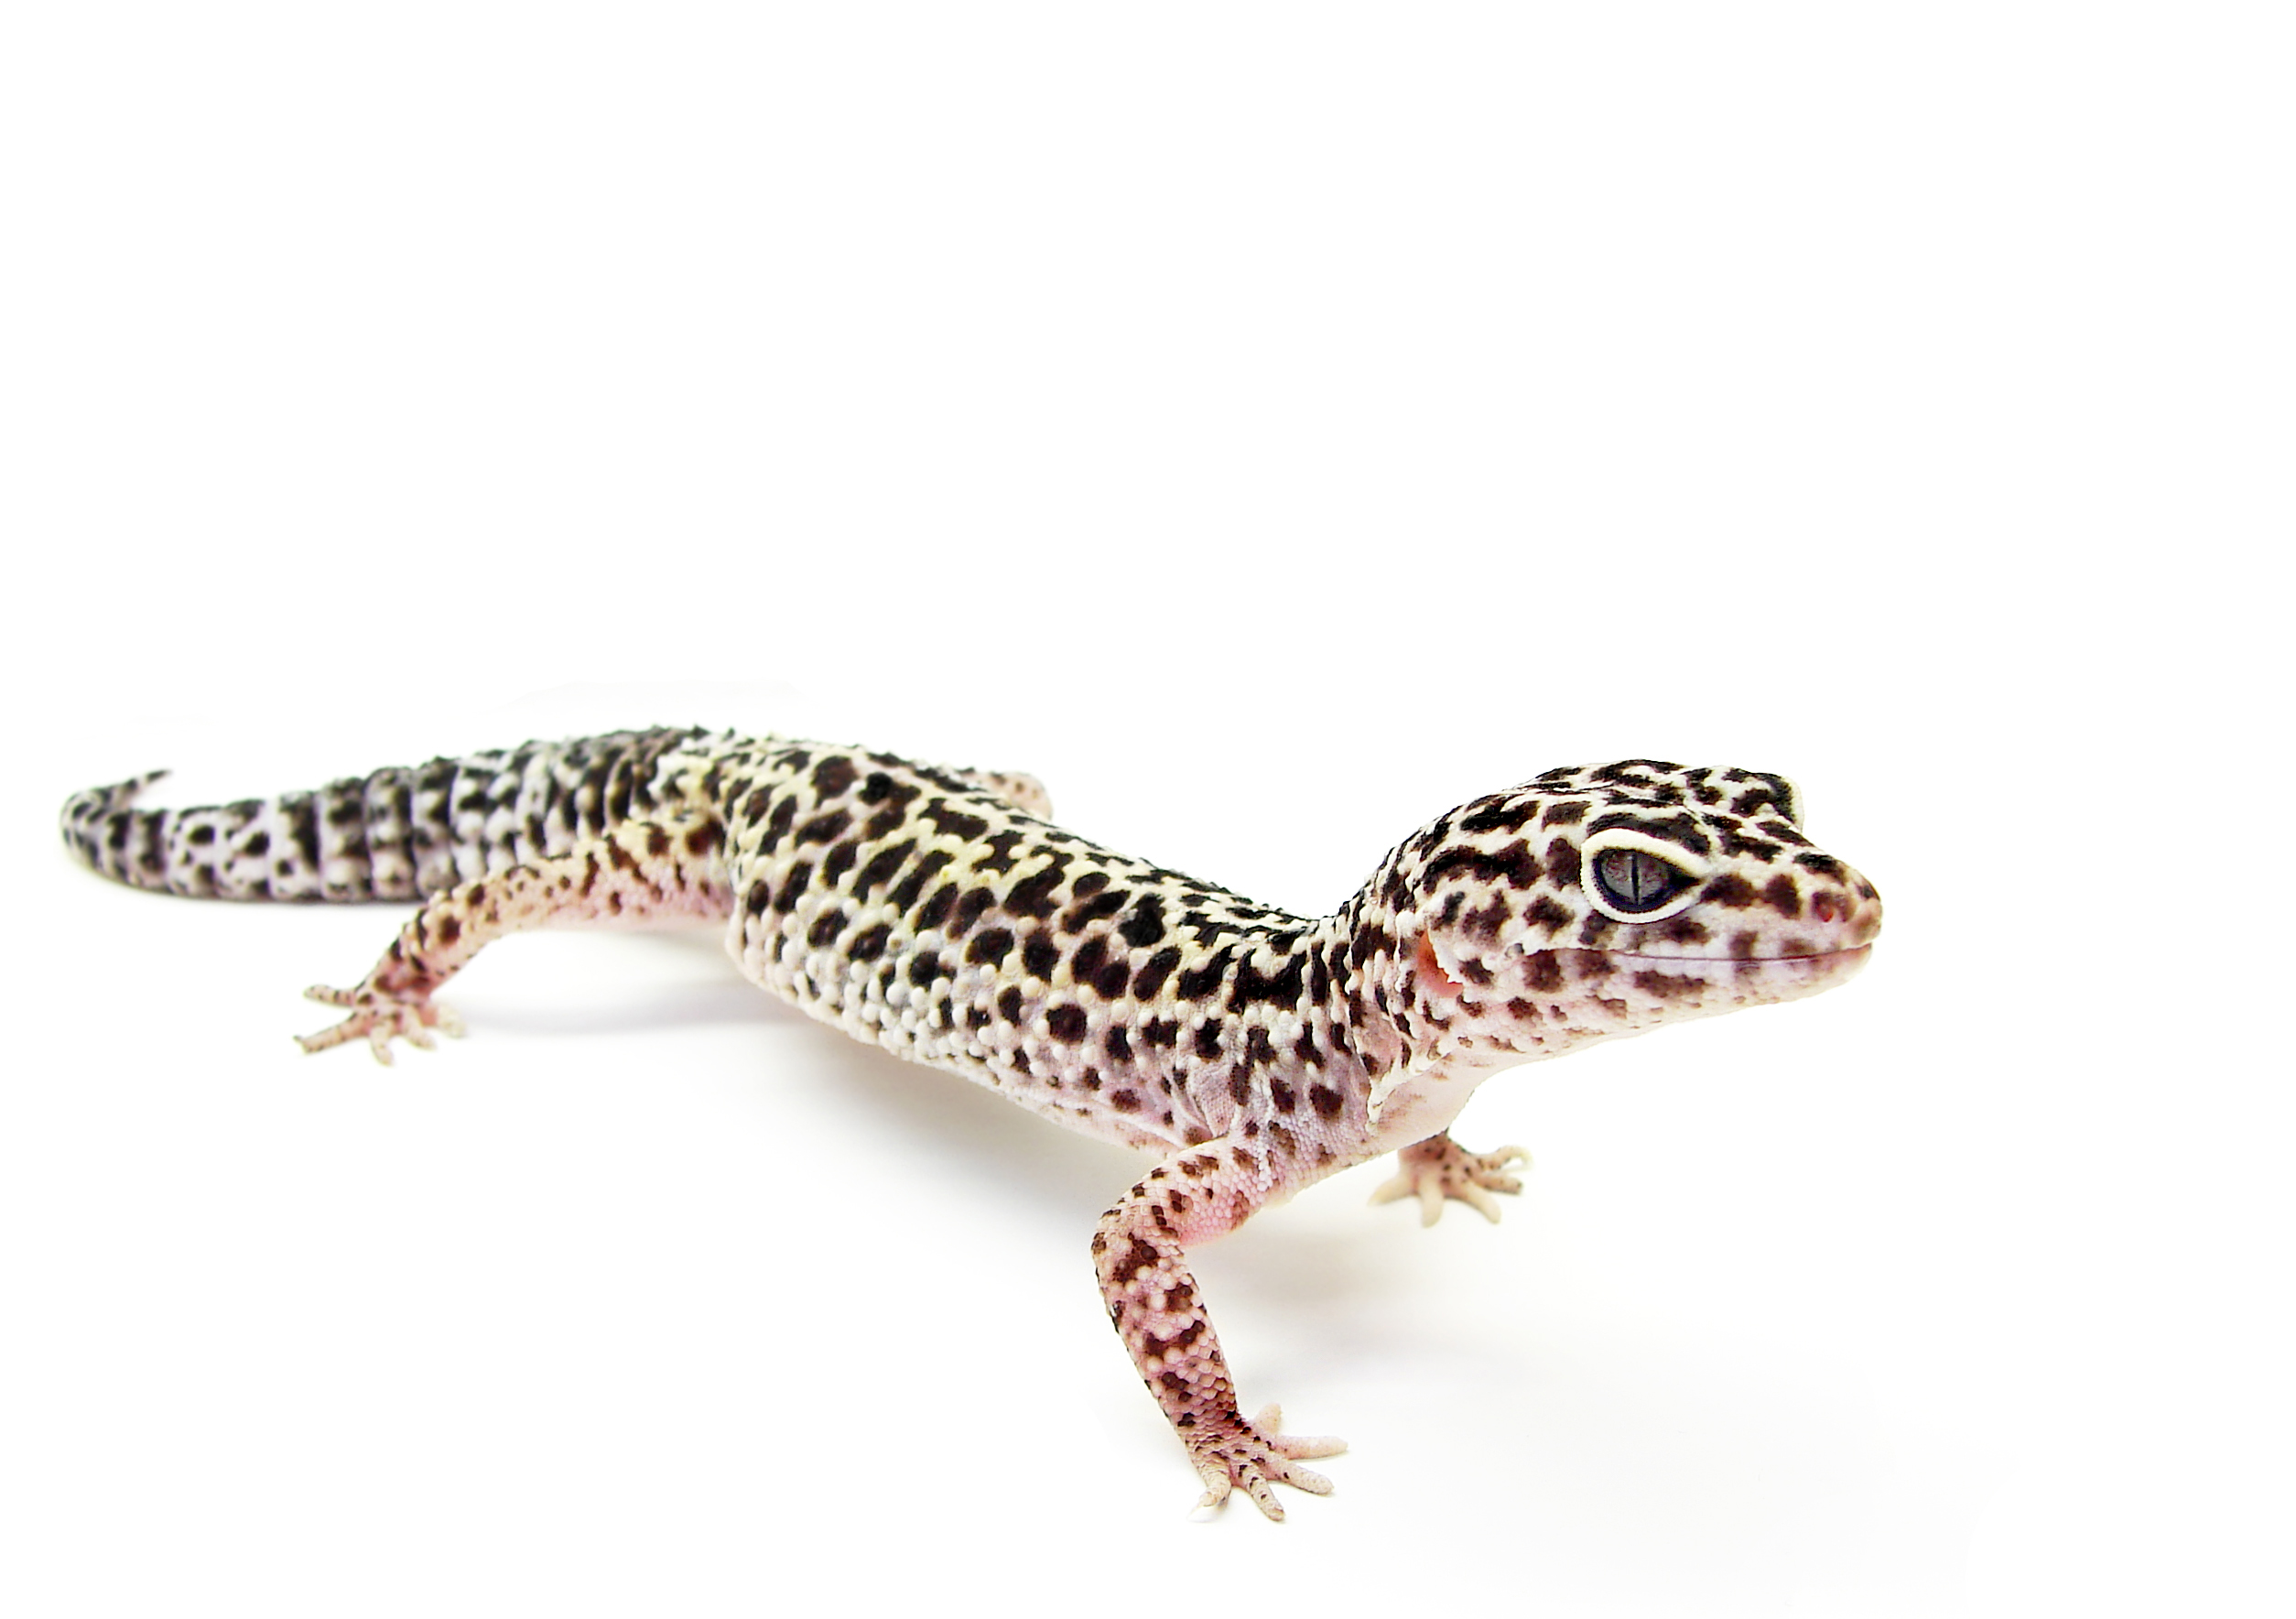 30 Cool Leopard Gecko Names - Leopard Gecko Talk  30 Cool Leopard...